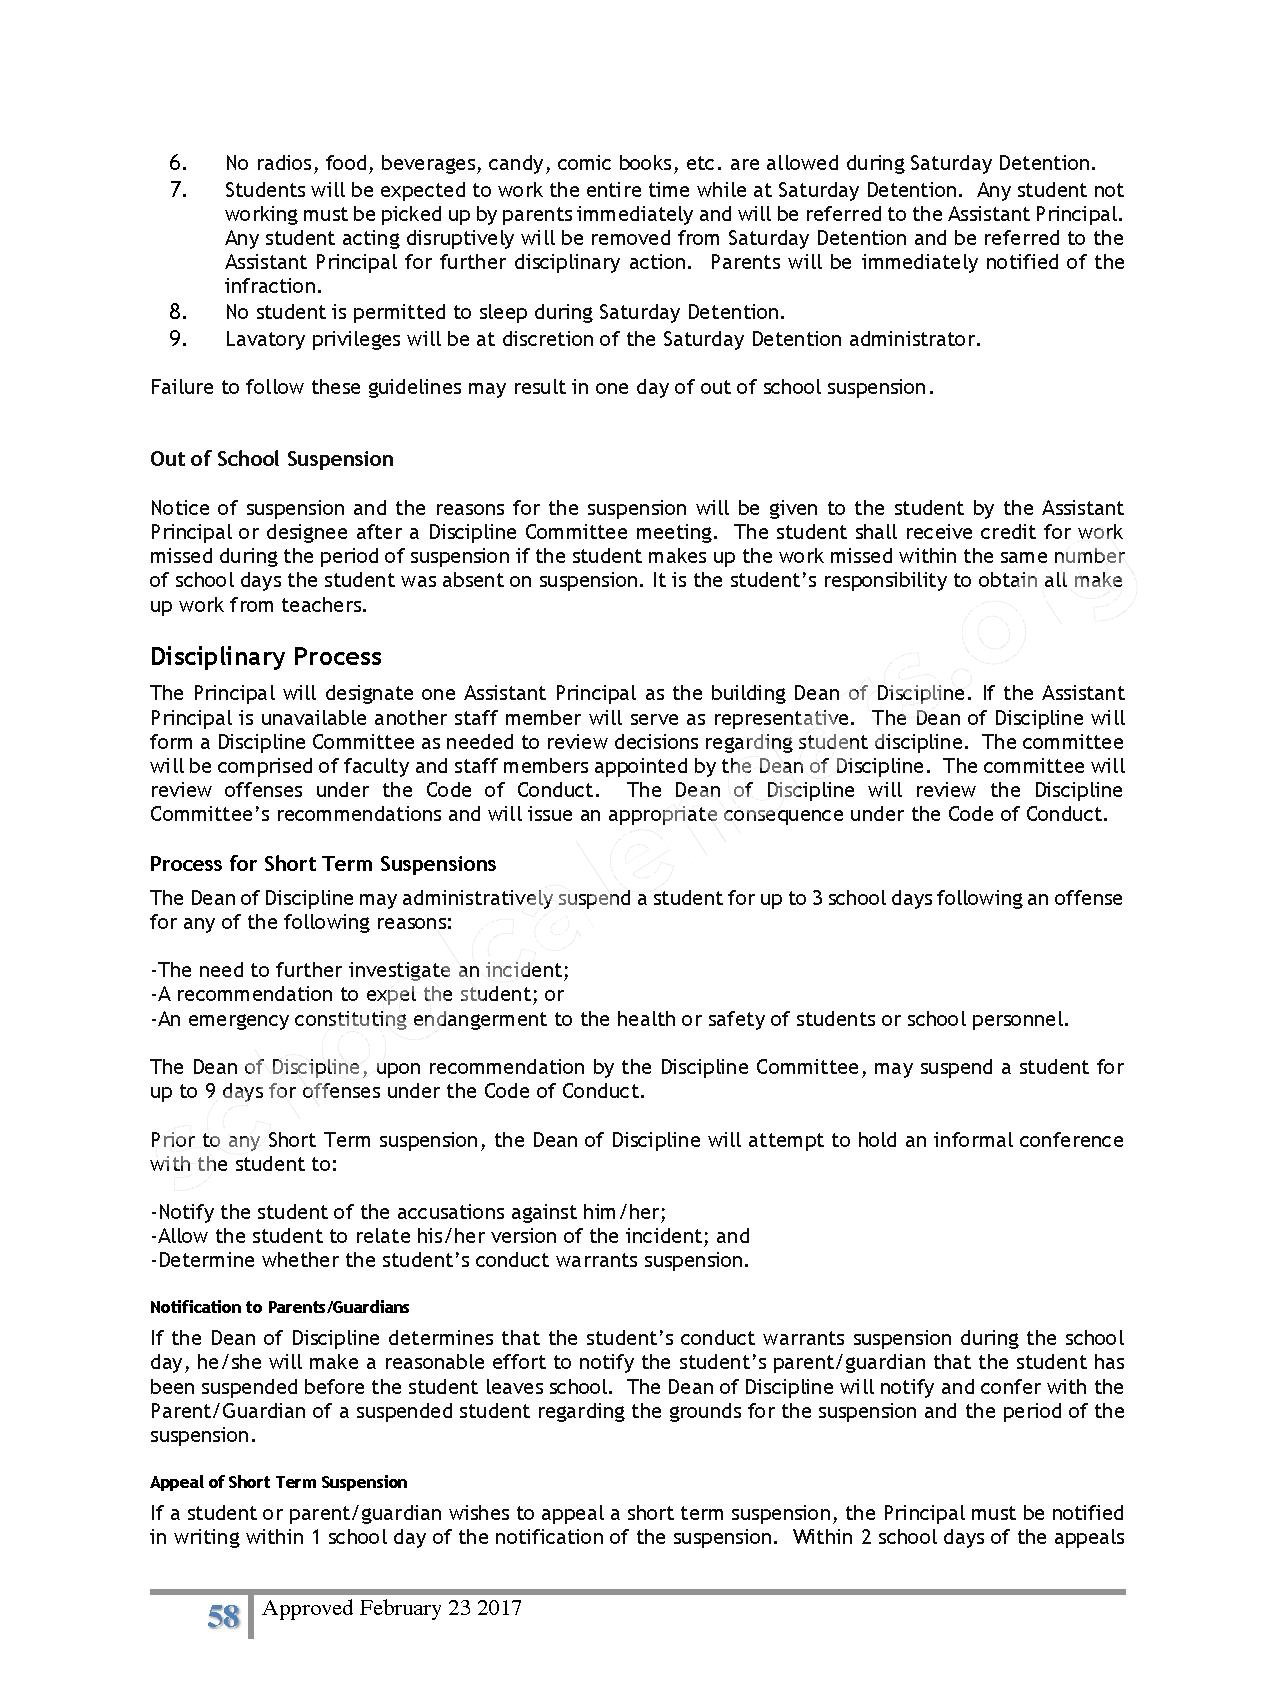 2016 - 2017 District Calendar – Lisa Academy Public Charter Schools – page 58